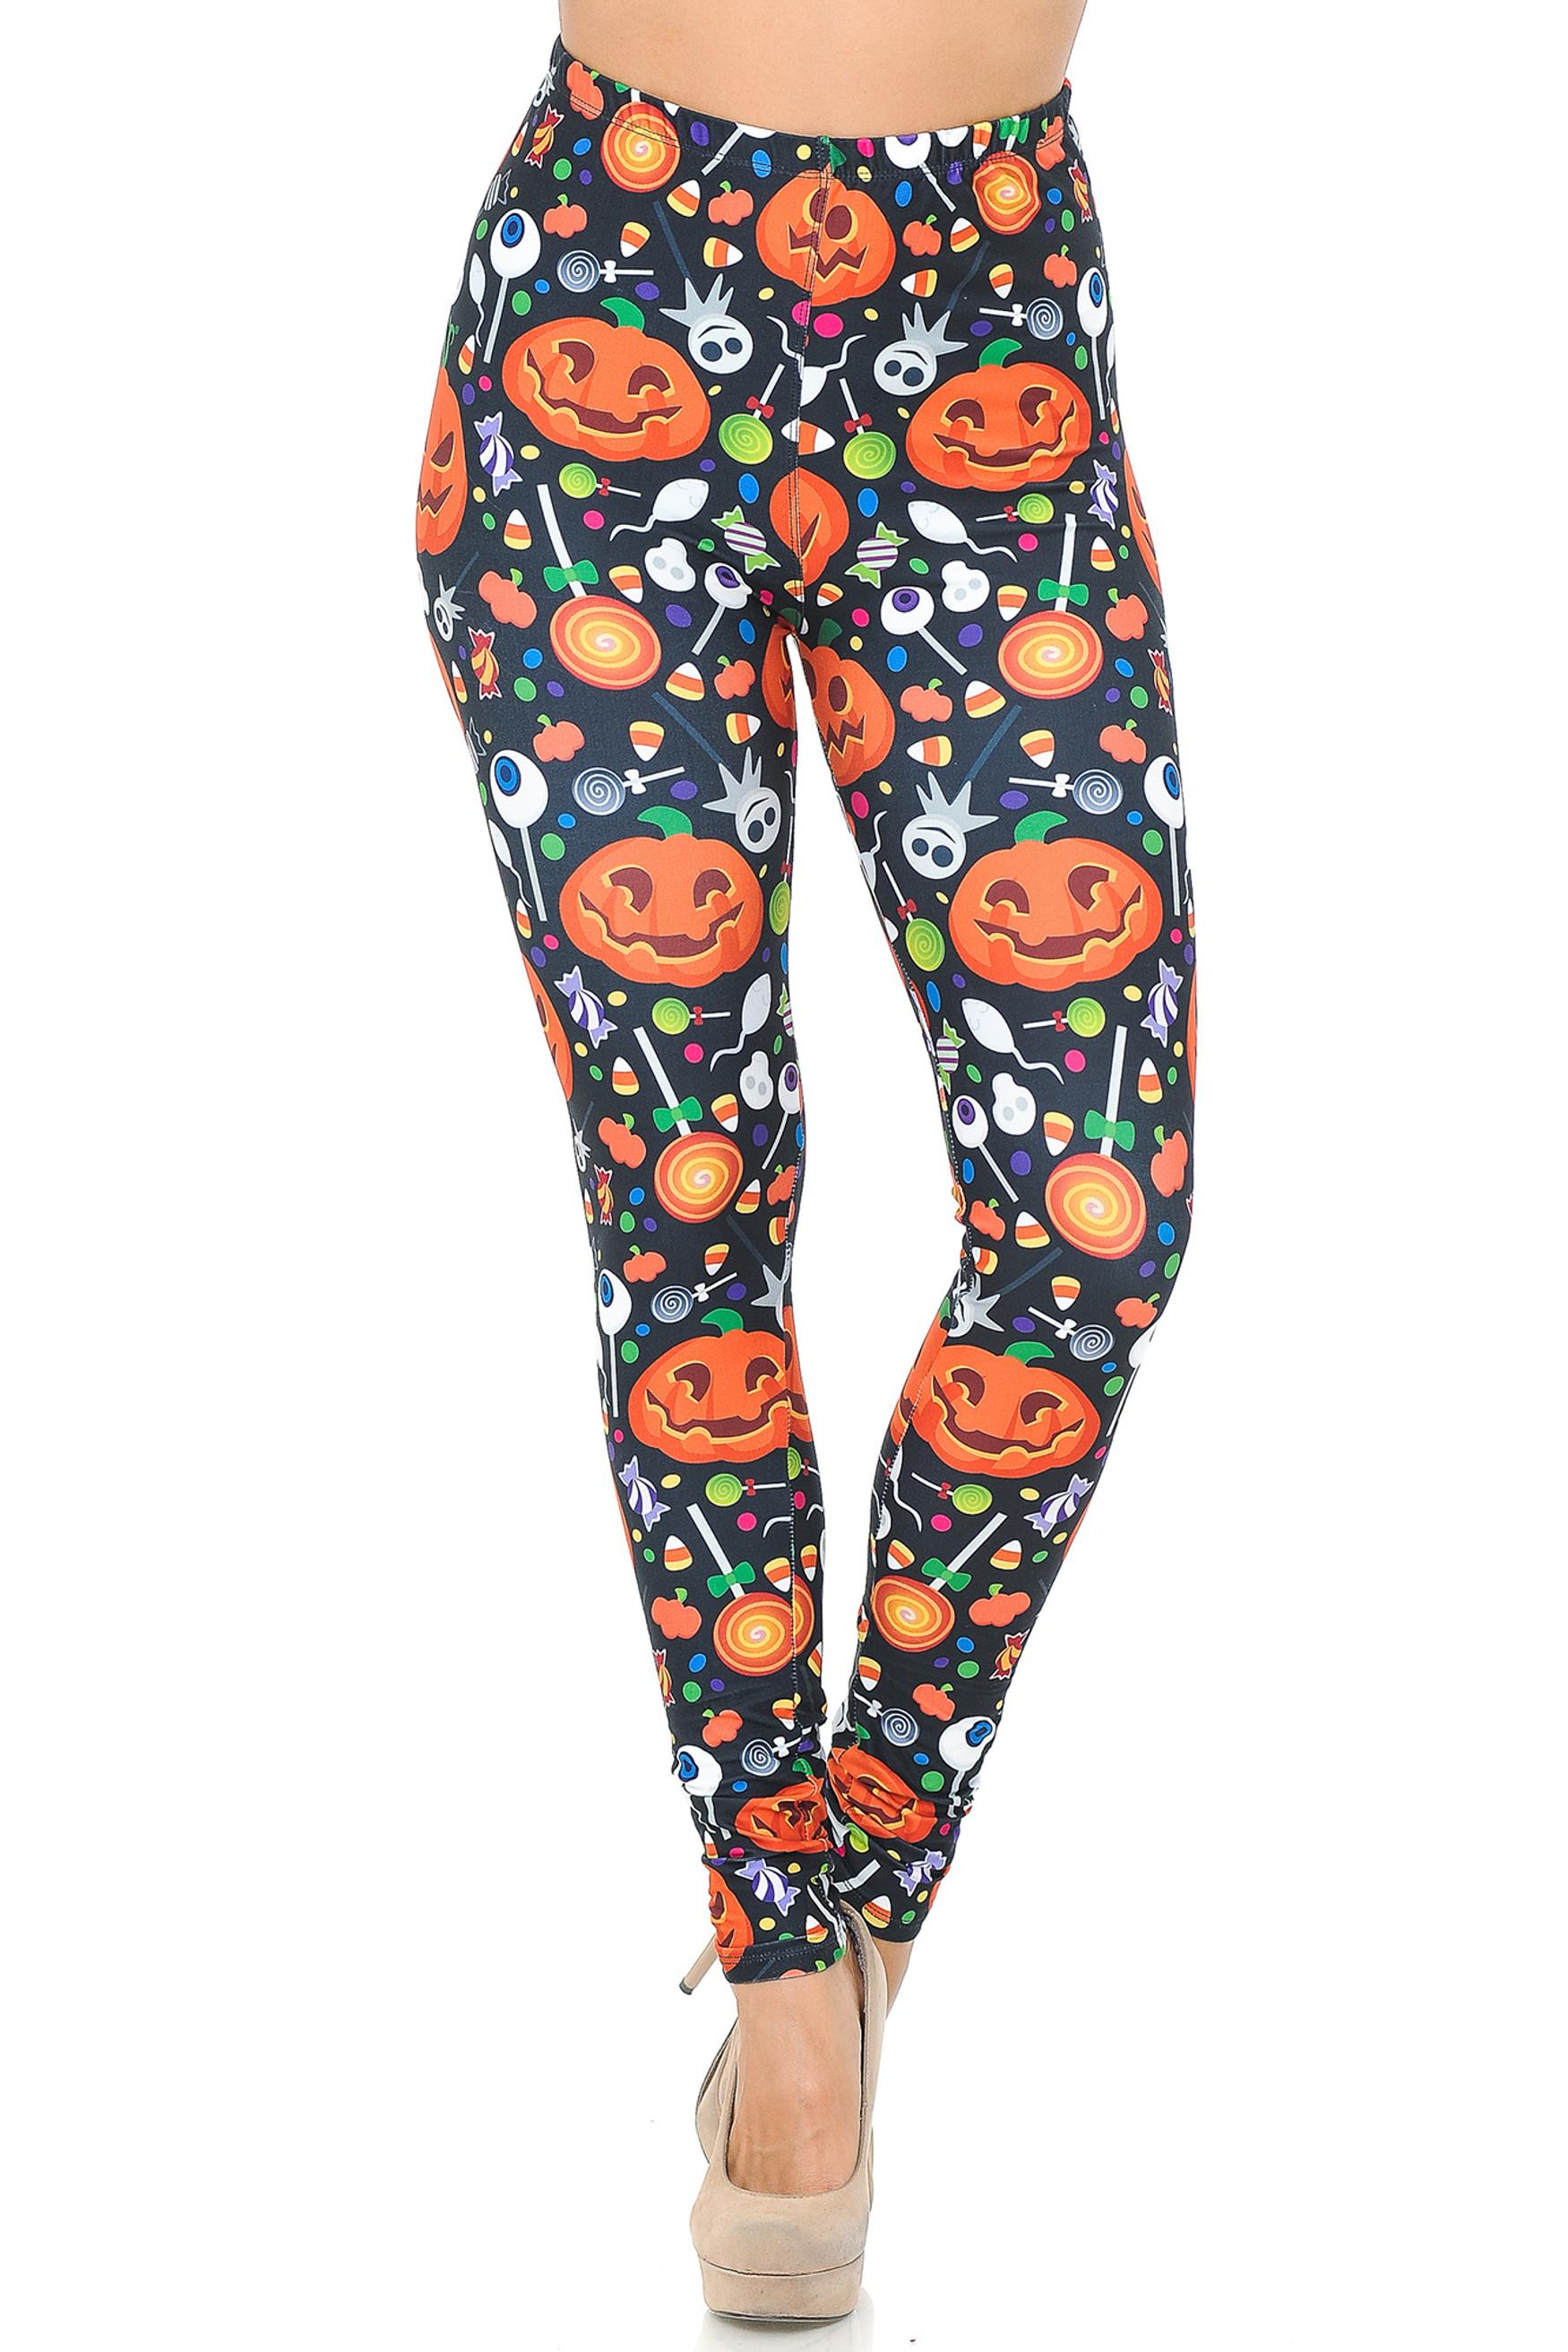 Creamy Soft Pumpkins and Halloween Candy Leggings - USA Fashion™